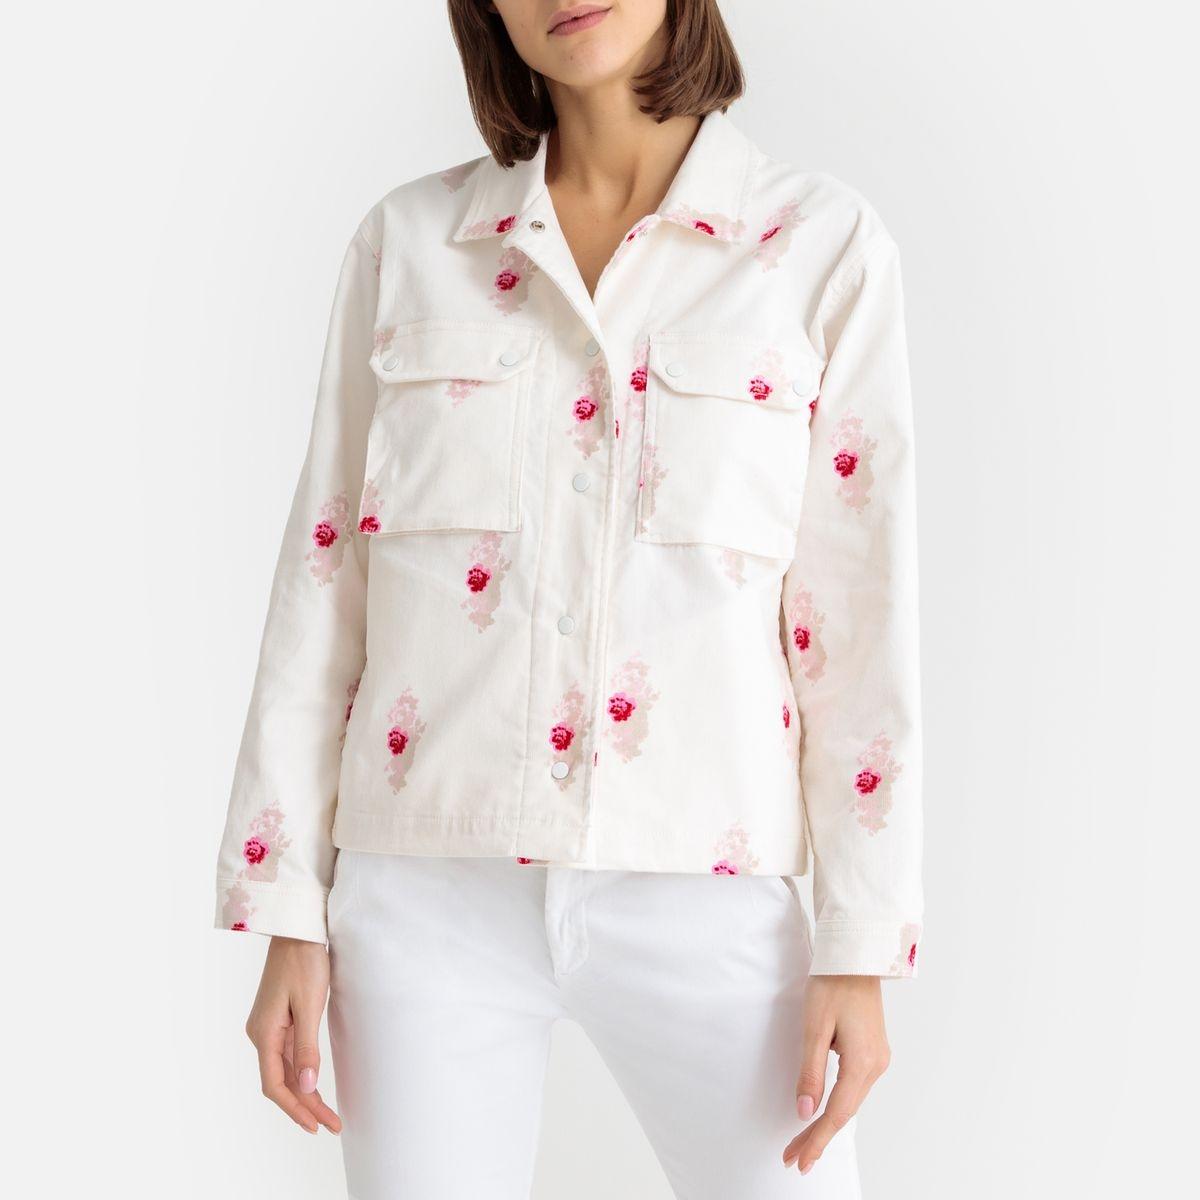 Veste chemise velours imprimé fleurs LYNDA